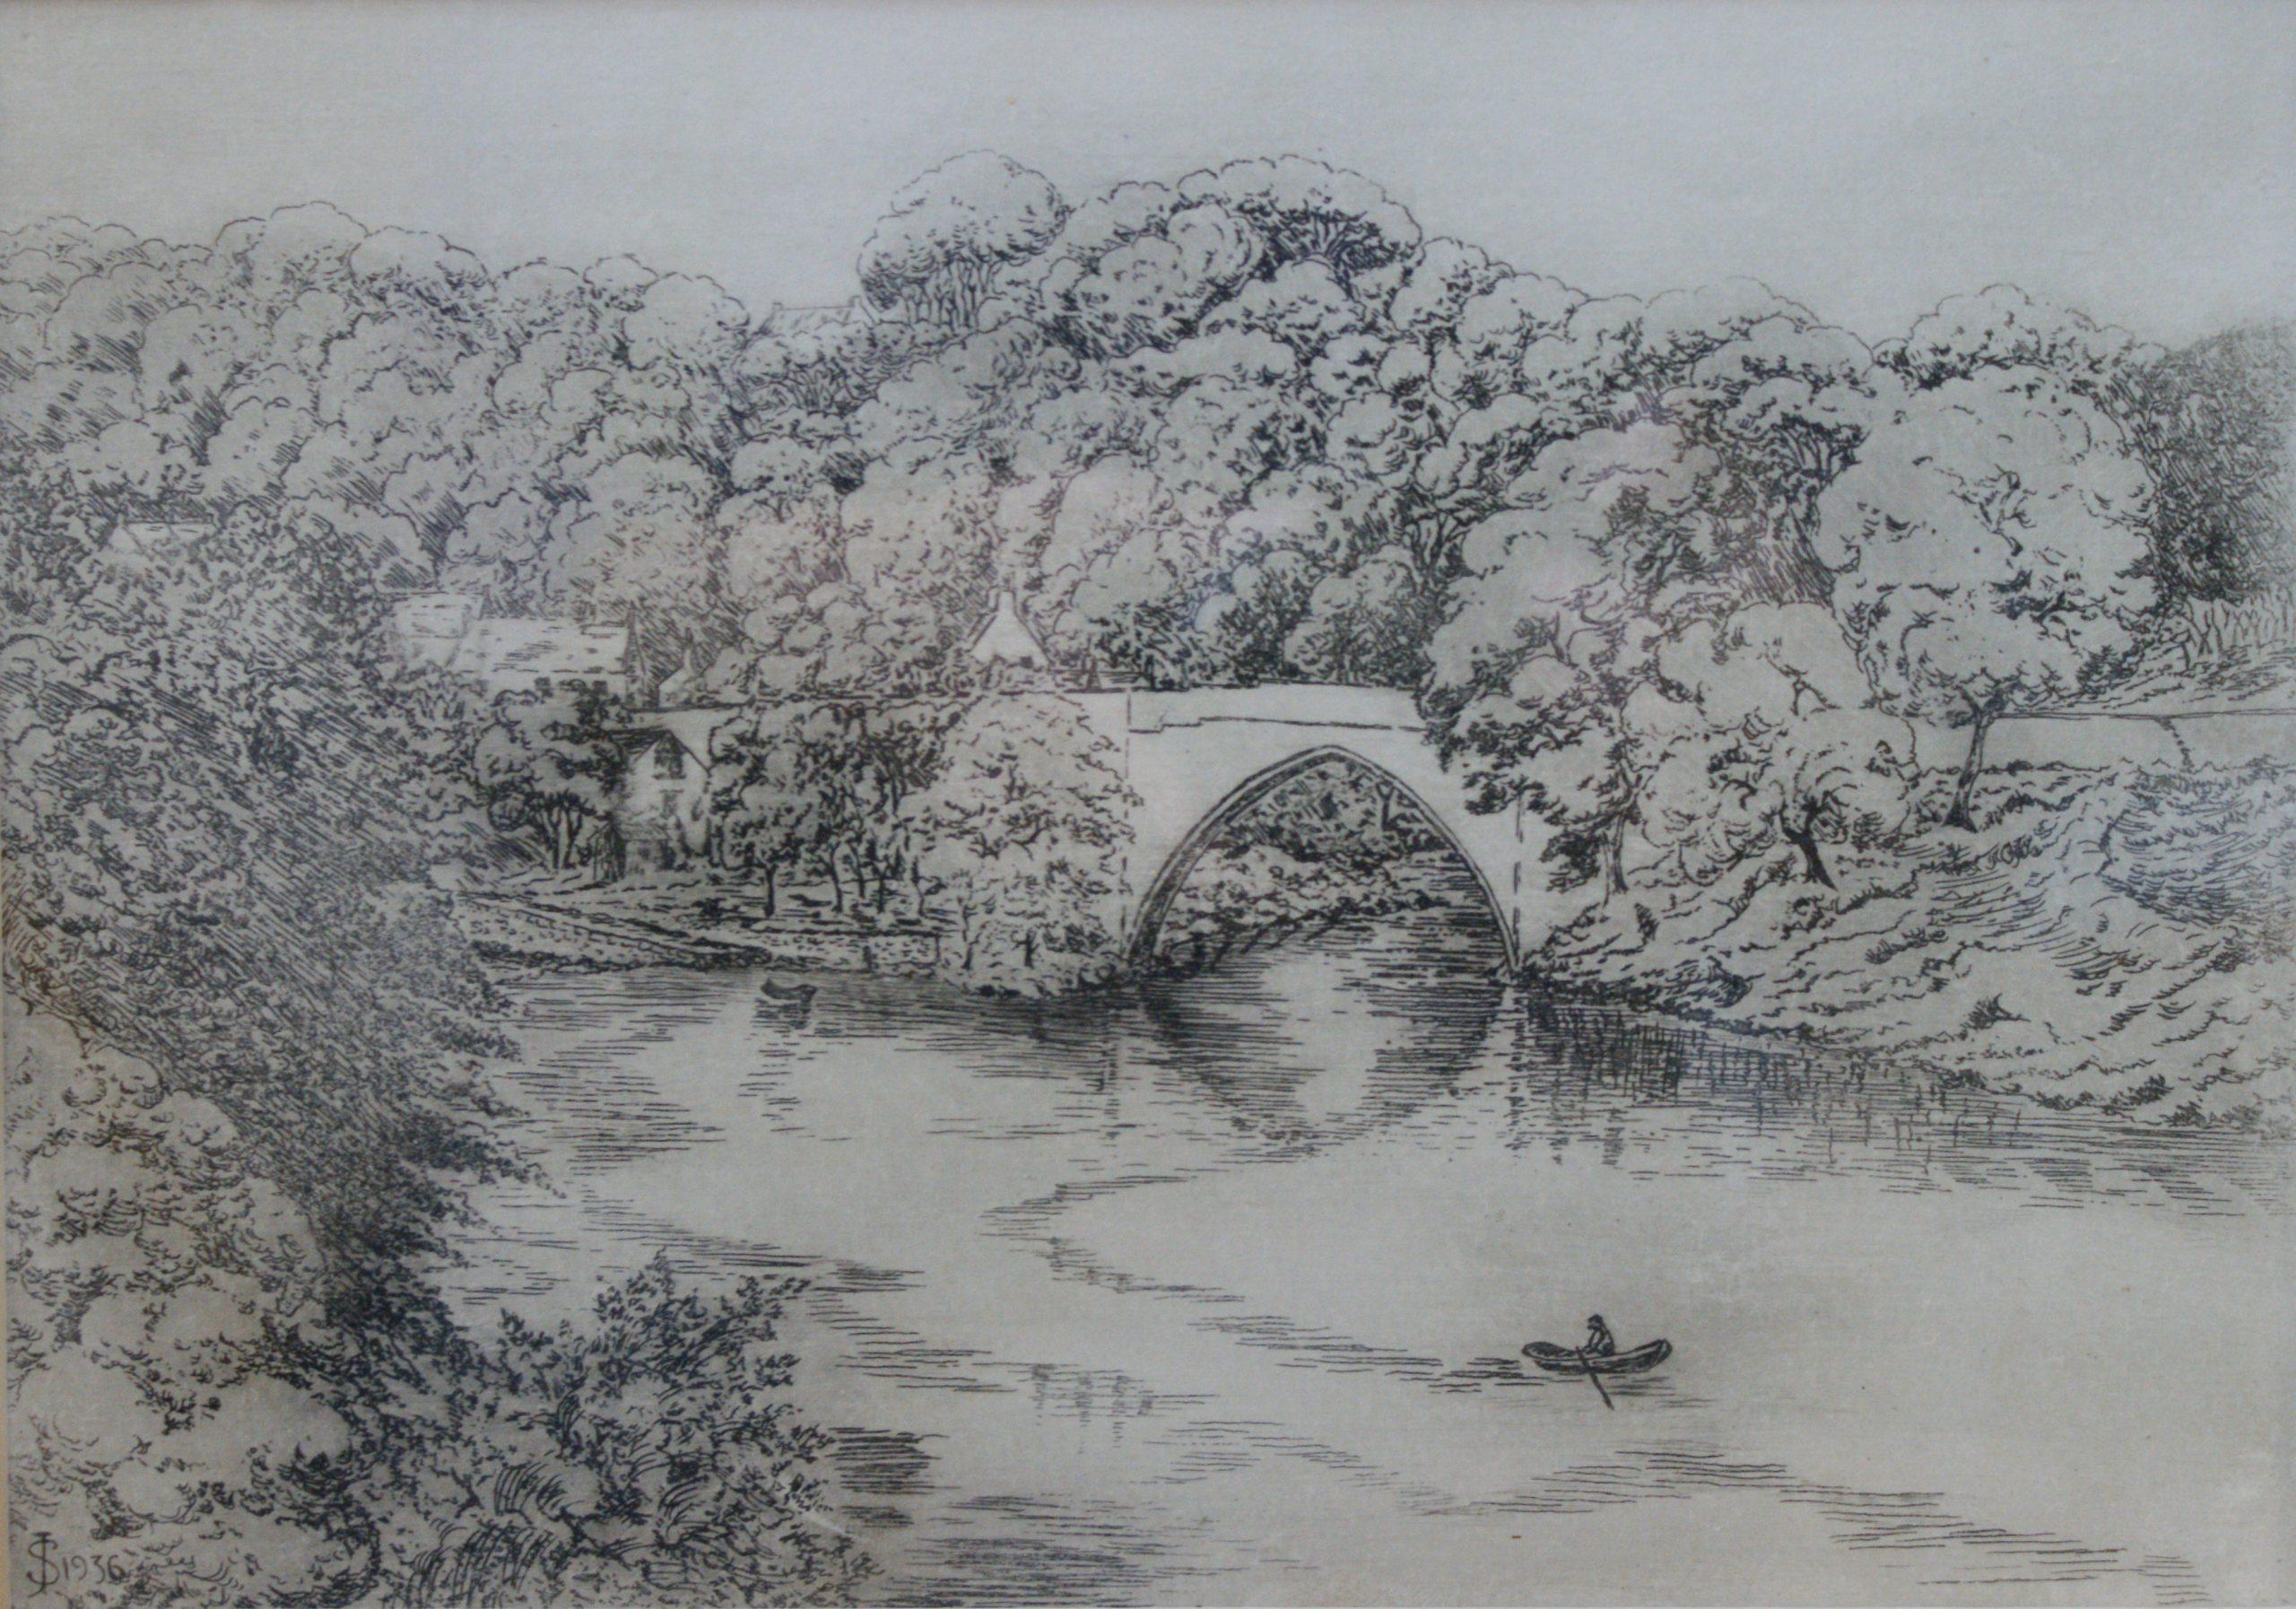 John Smith - The Bridge